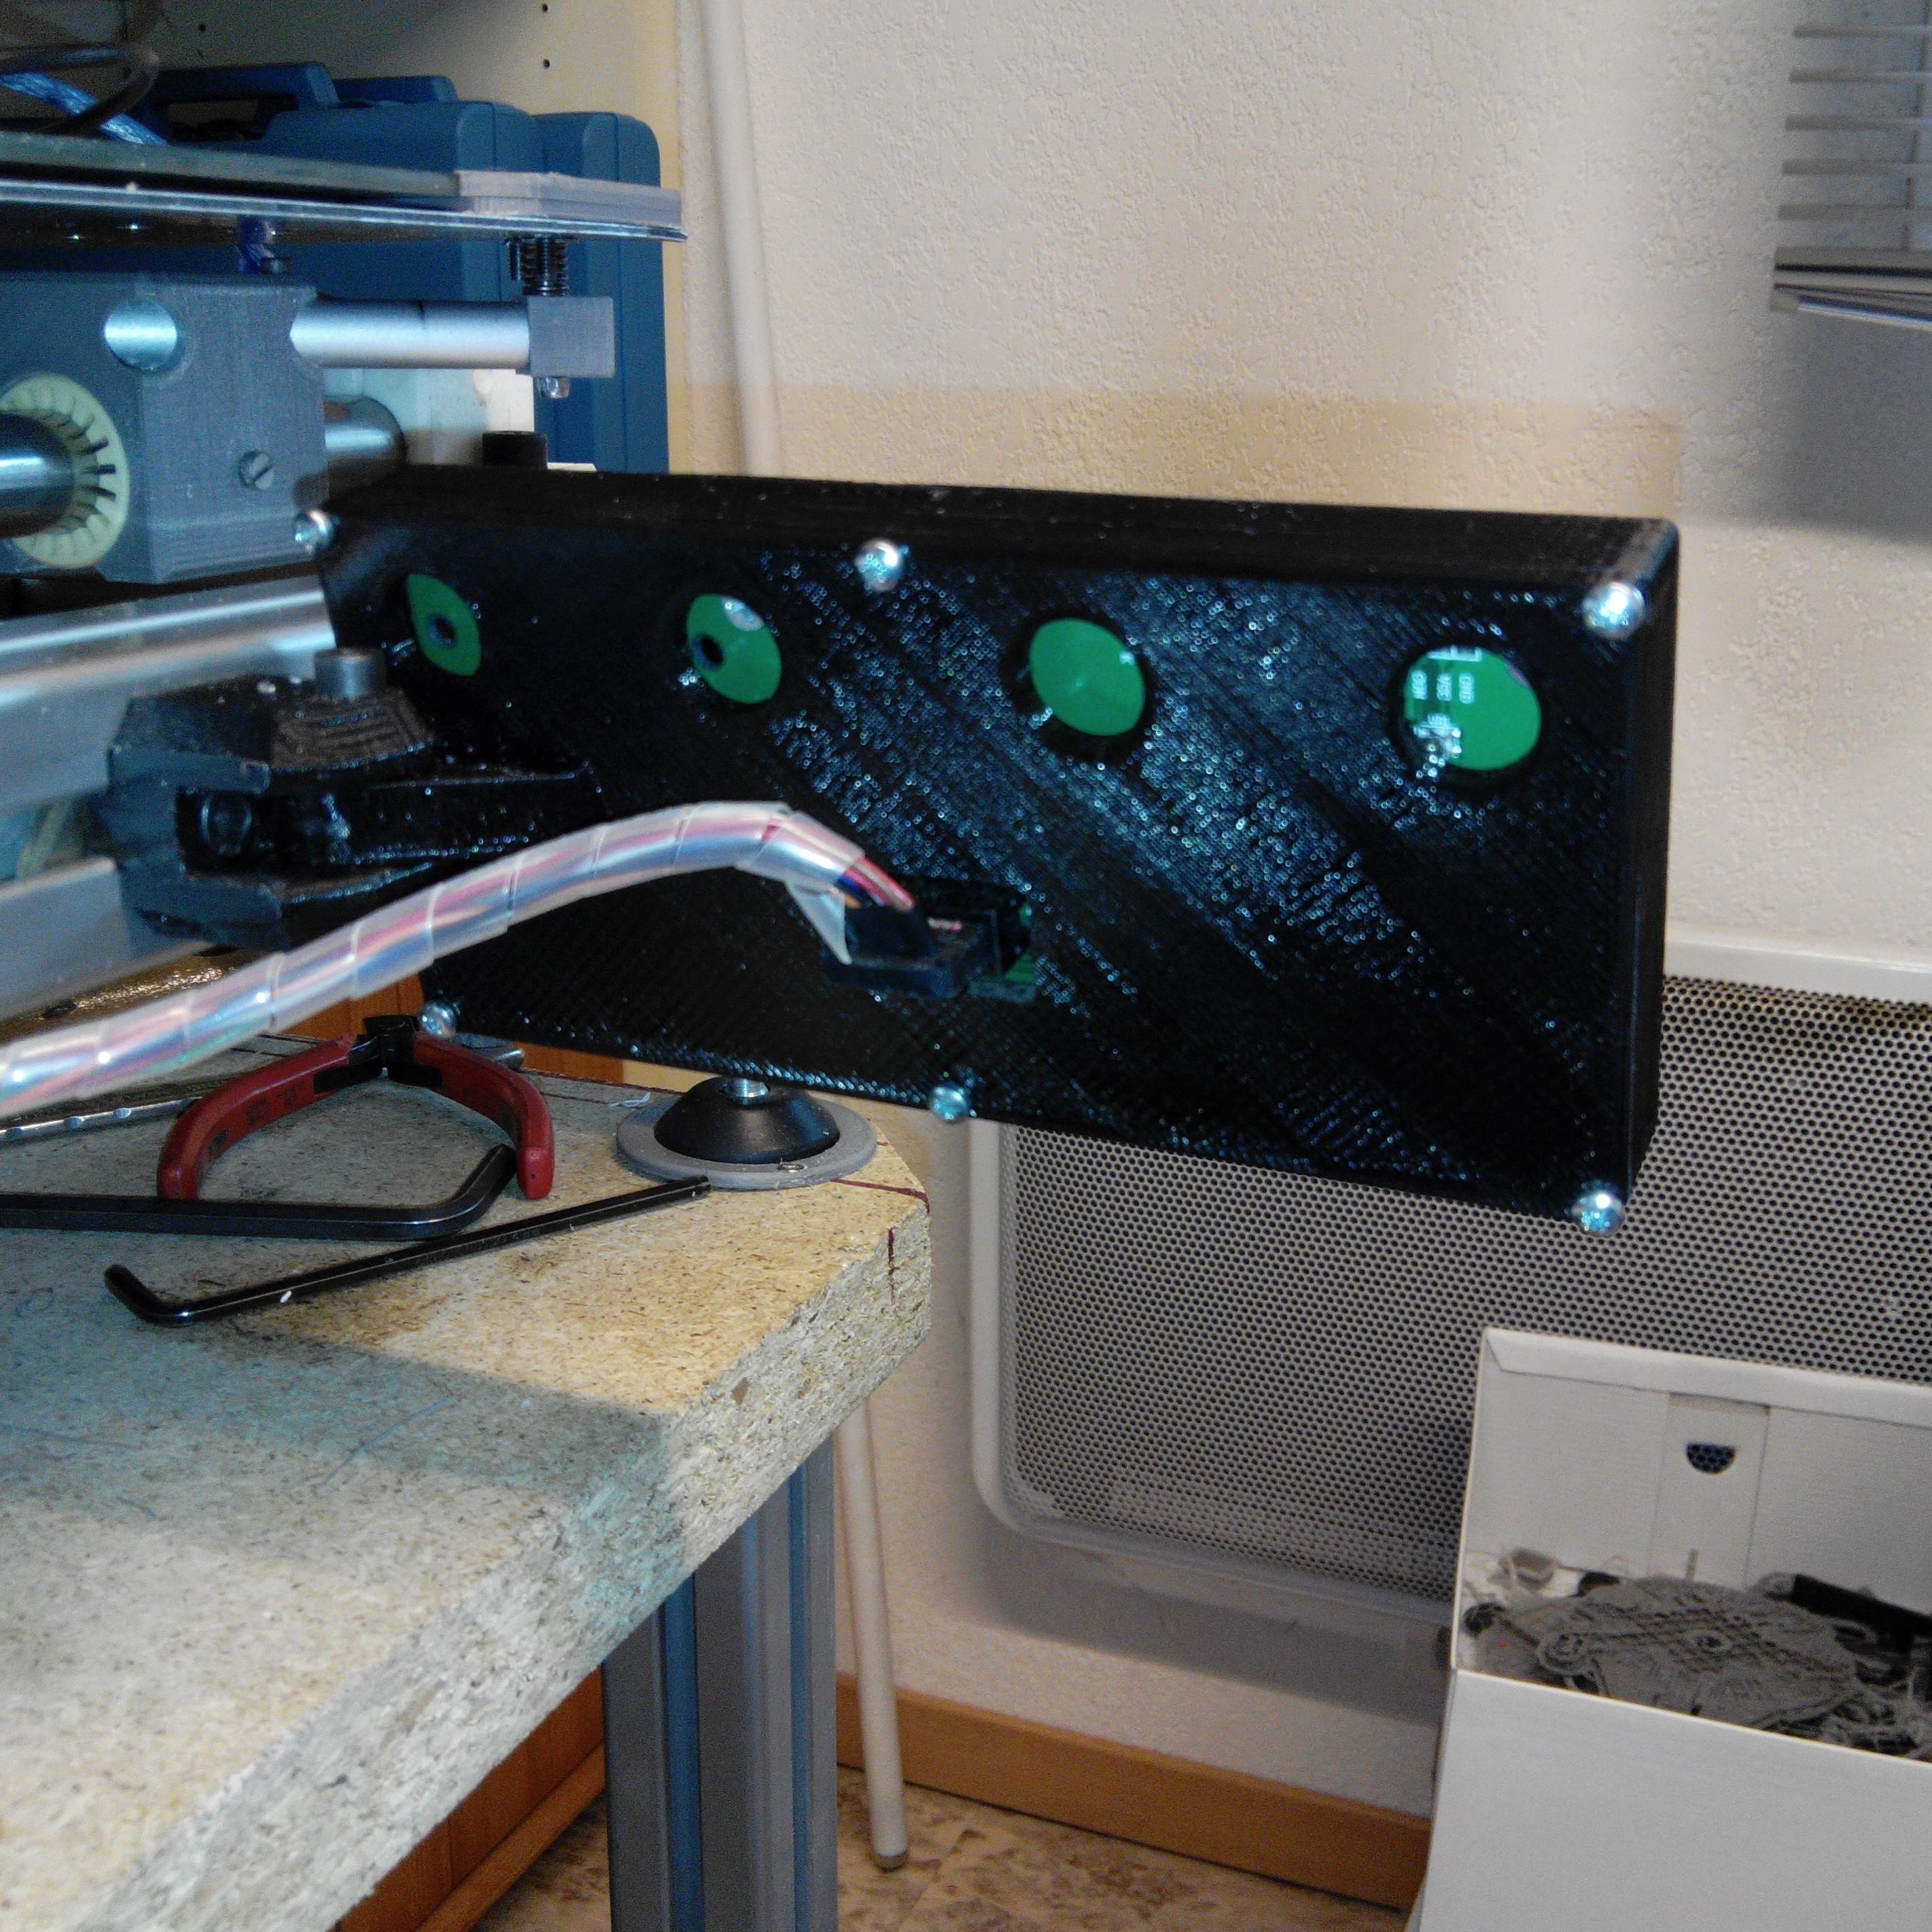 boitier face ARRIERE.JPG Download free STL file Display case Prusa I3 • 3D printer model, Alienmaker